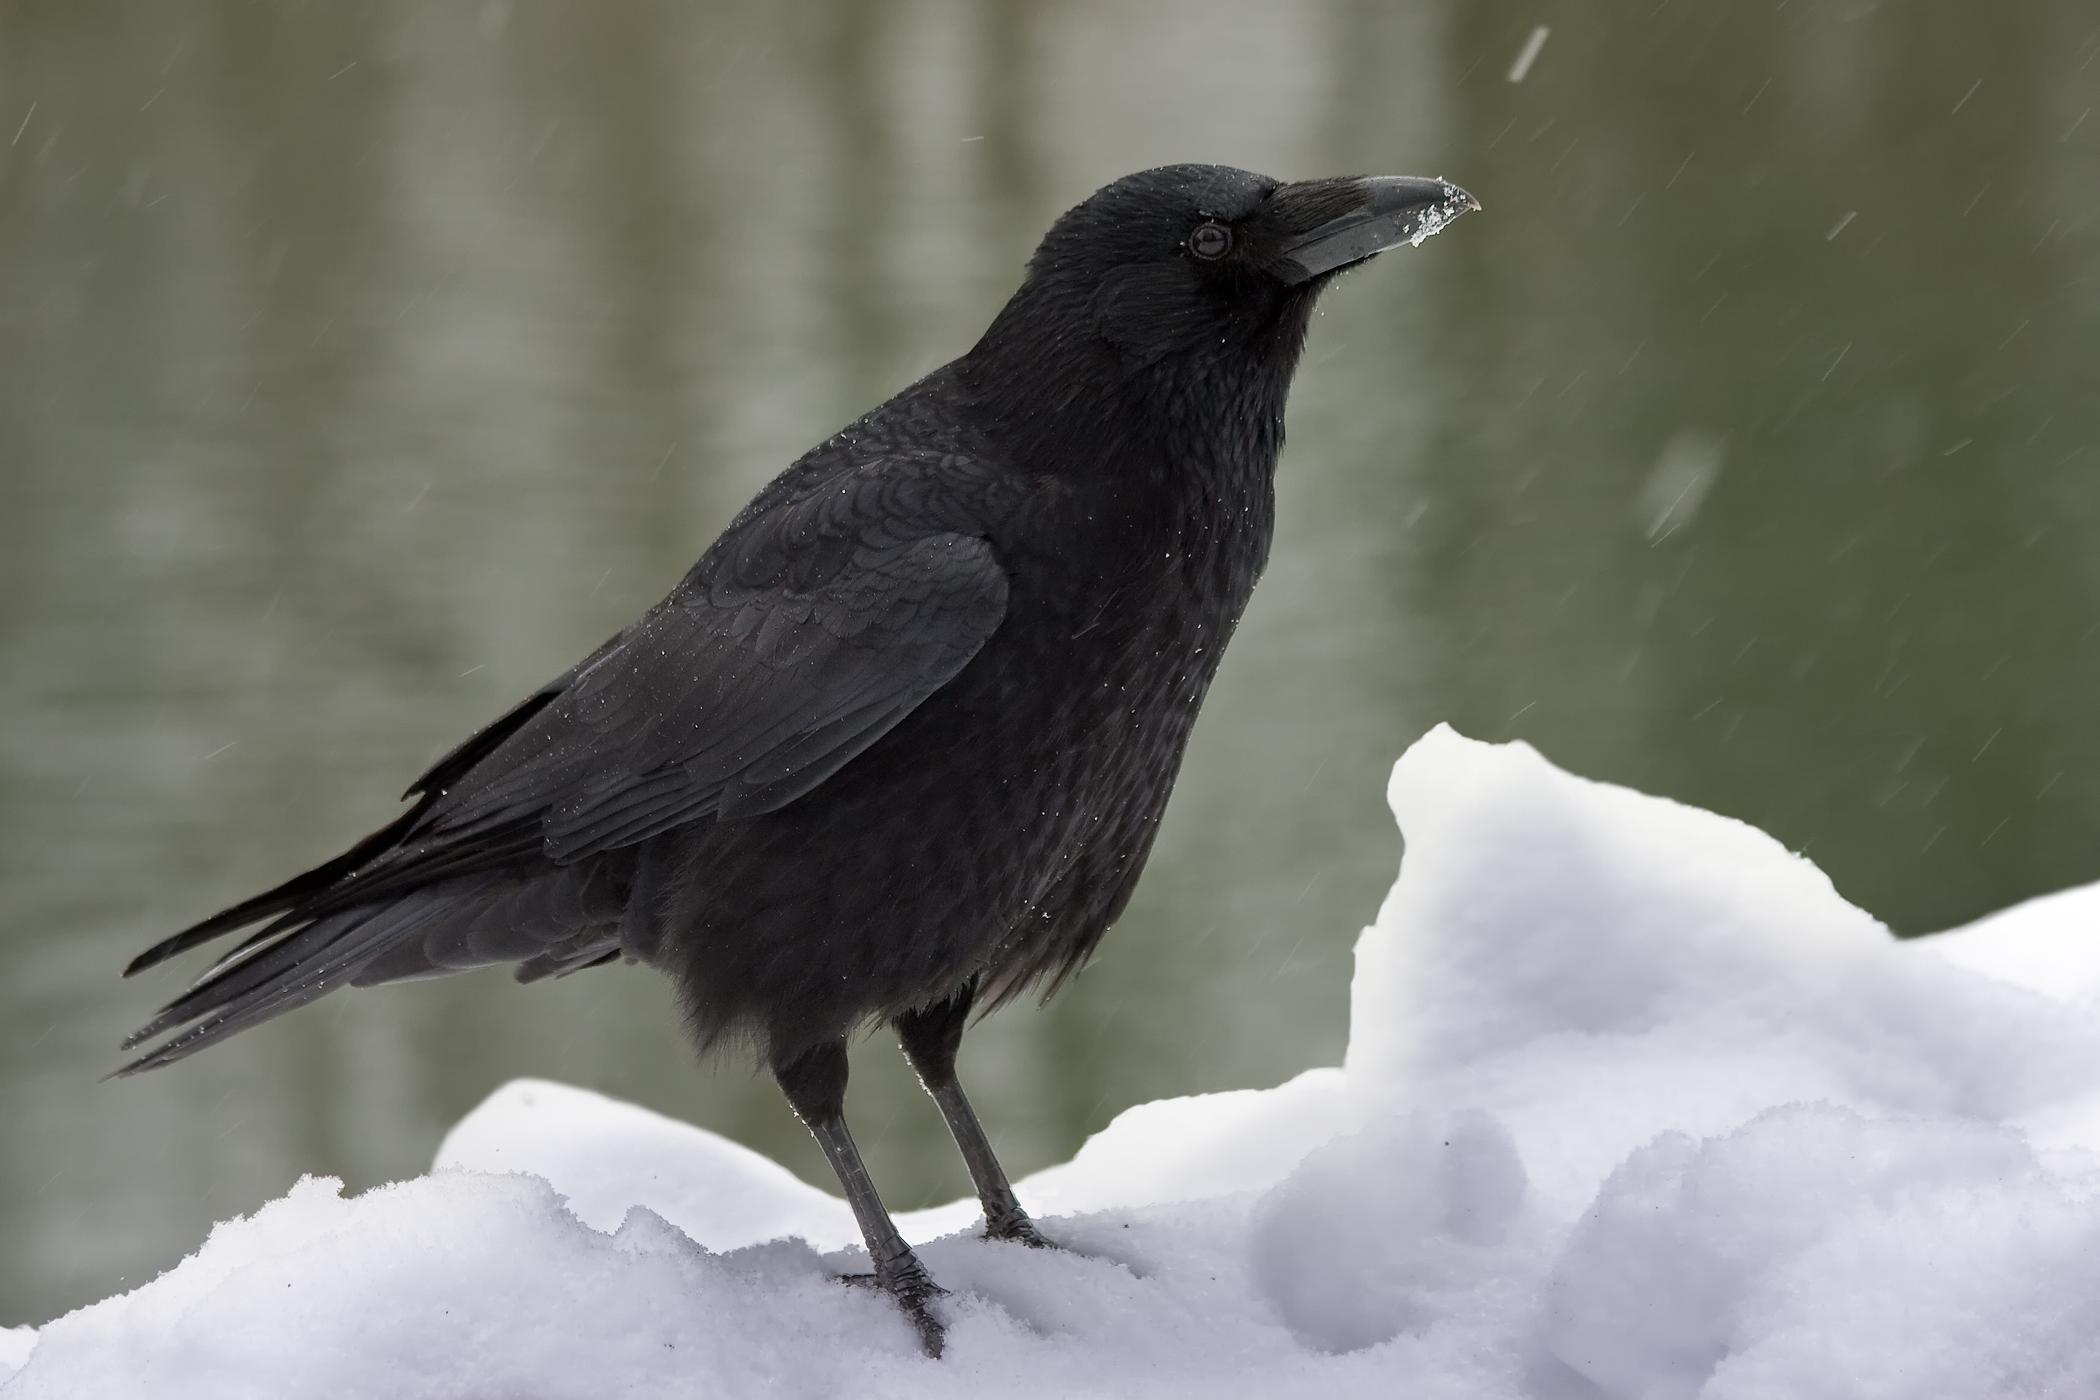 Fichier:Carrion Crow Corvus corone.jpg — Wikipédia